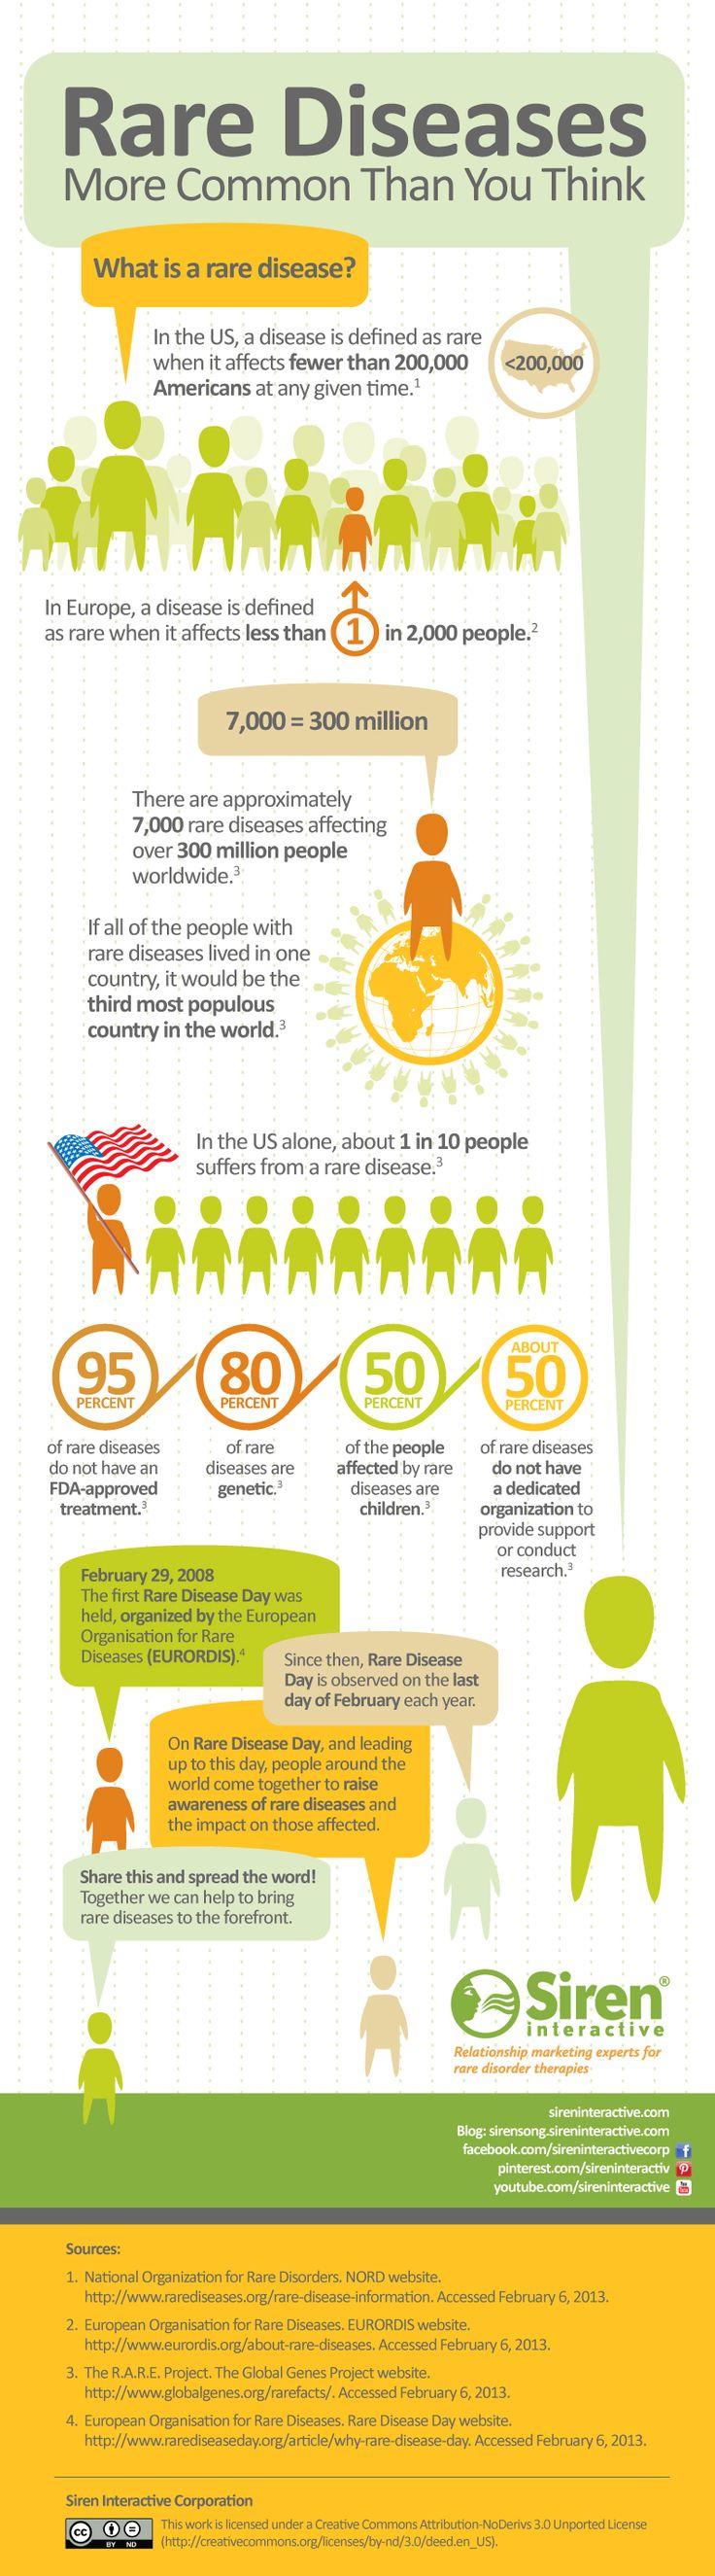 Rare Disease Infographic